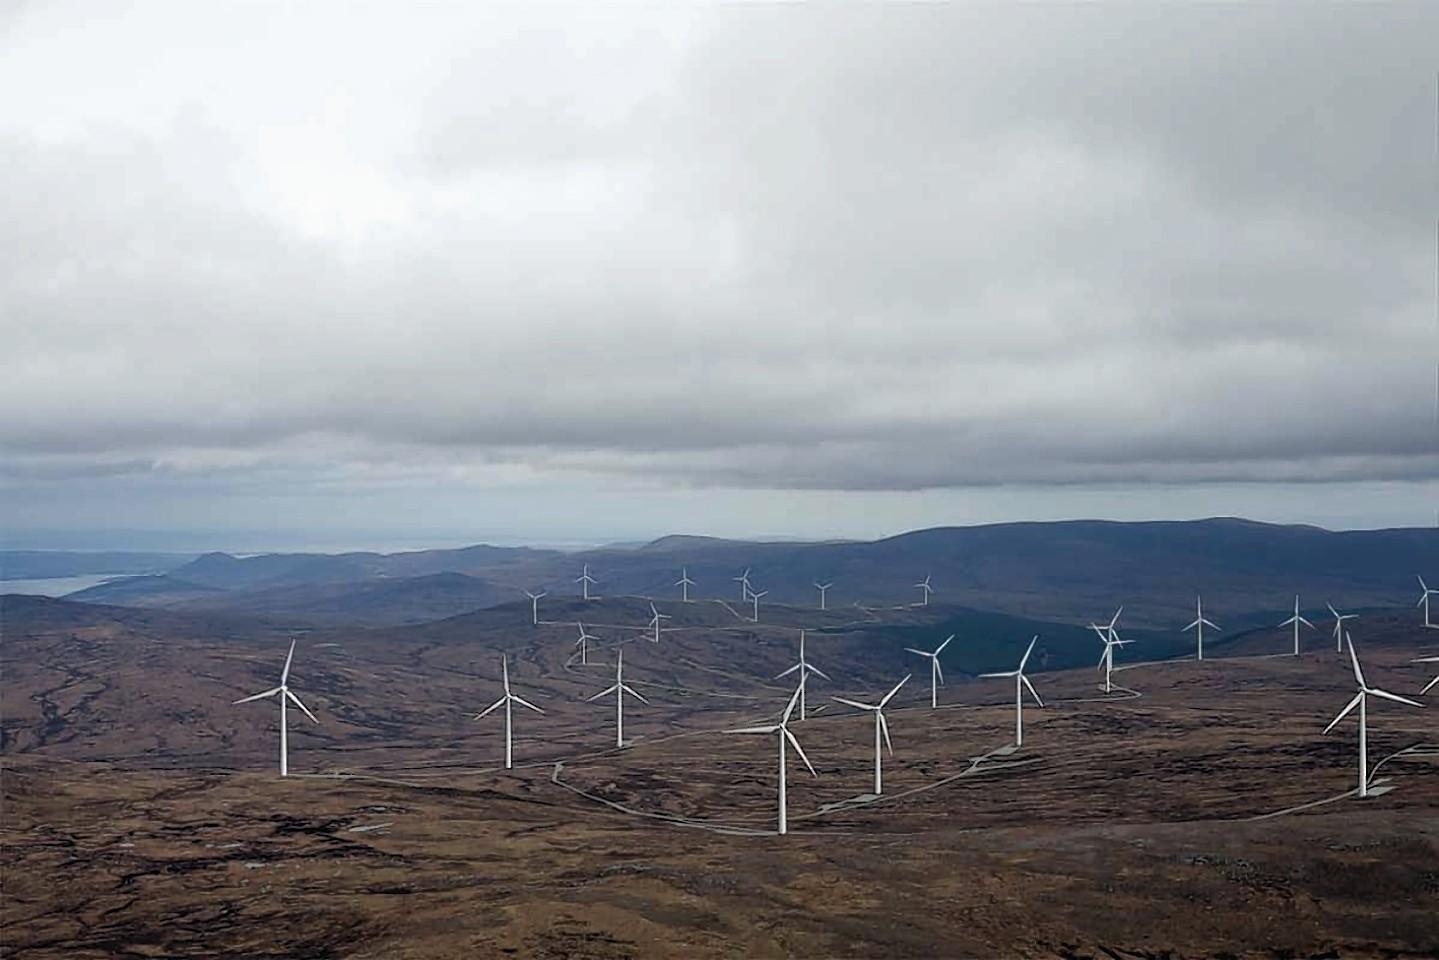 A photomontage of the Glenmorie windfarm.